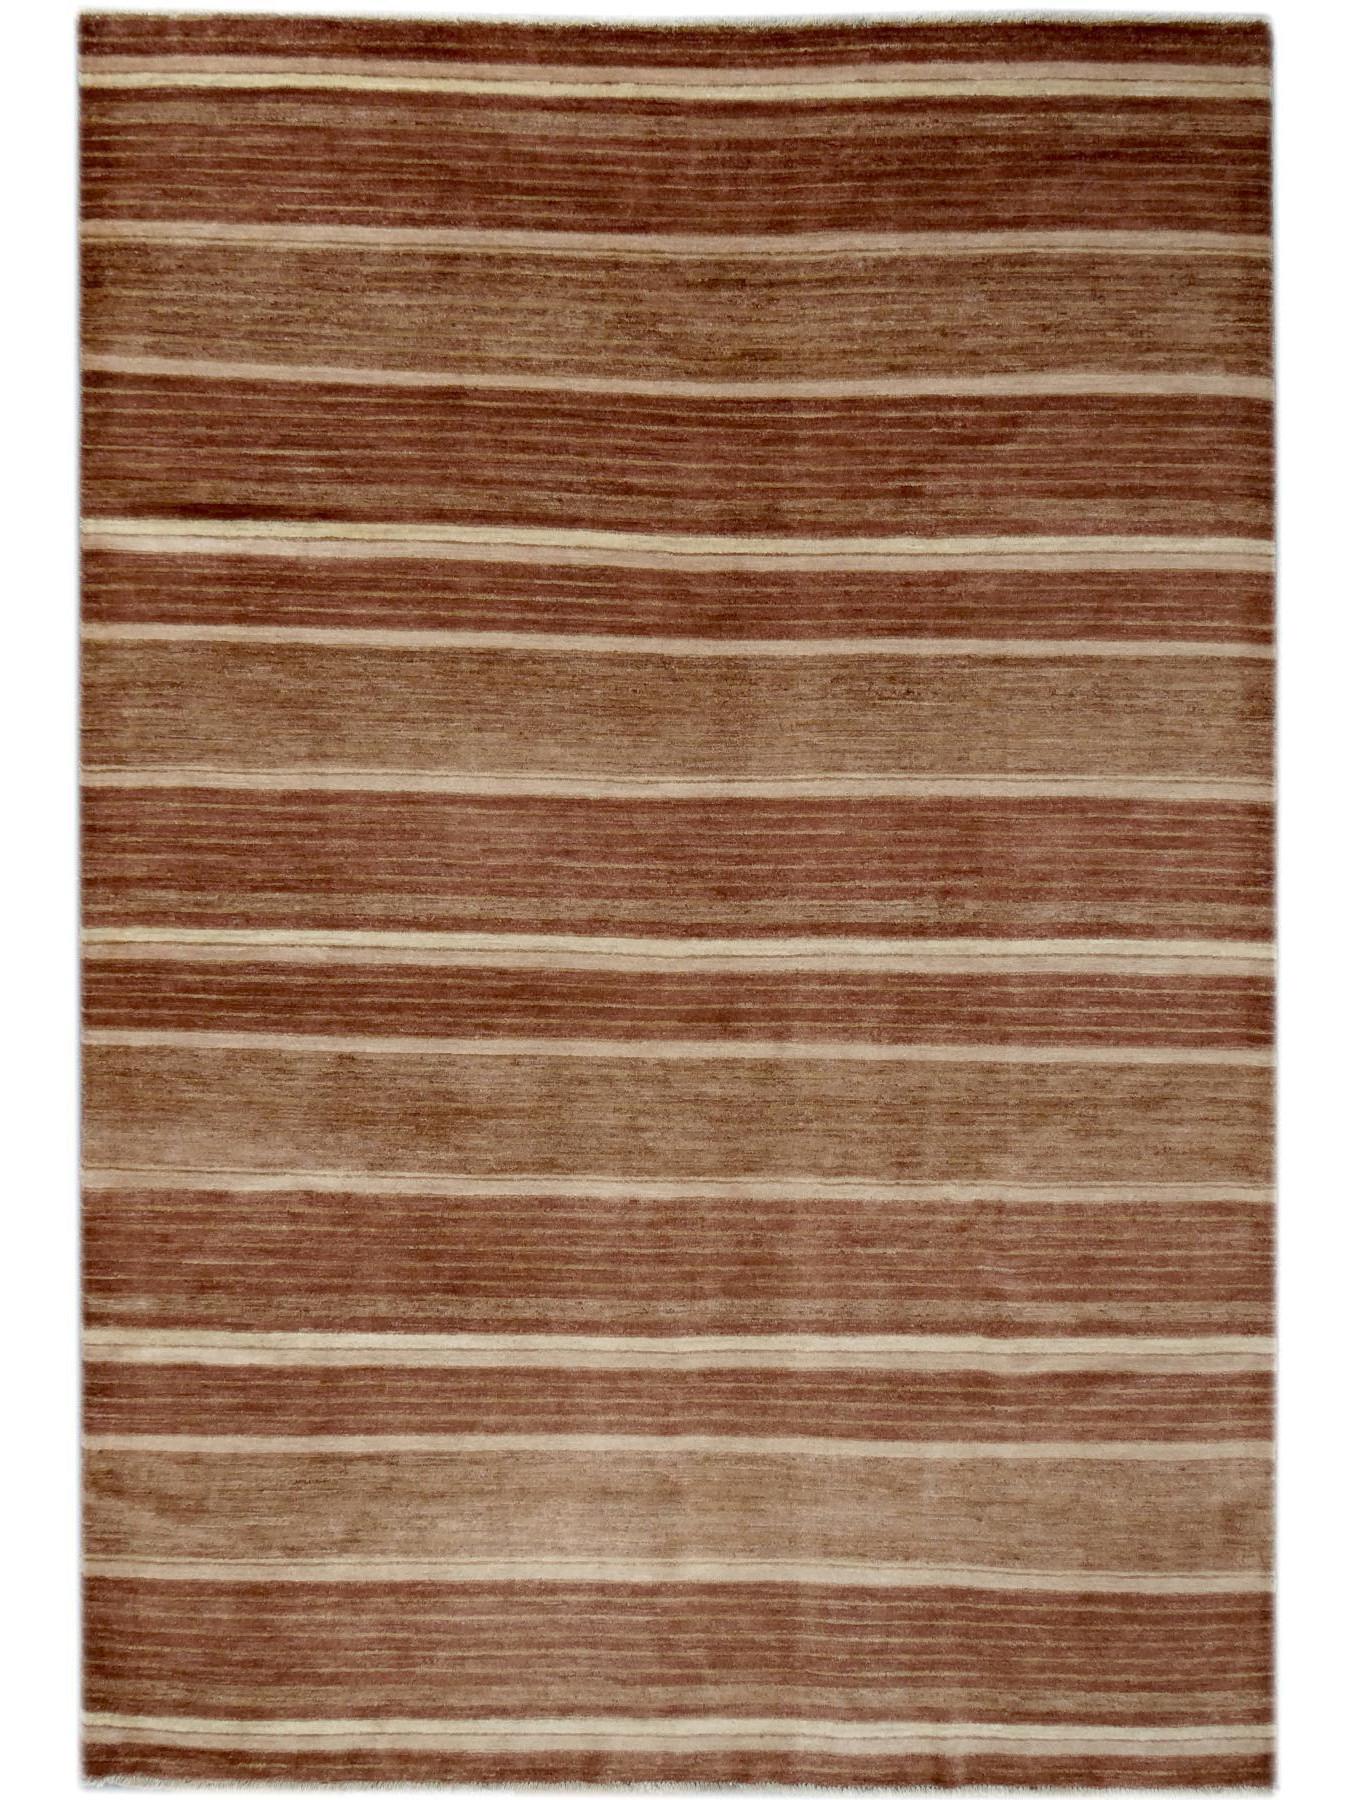 Ethnic carpets - TIMUR - DESERT 3318